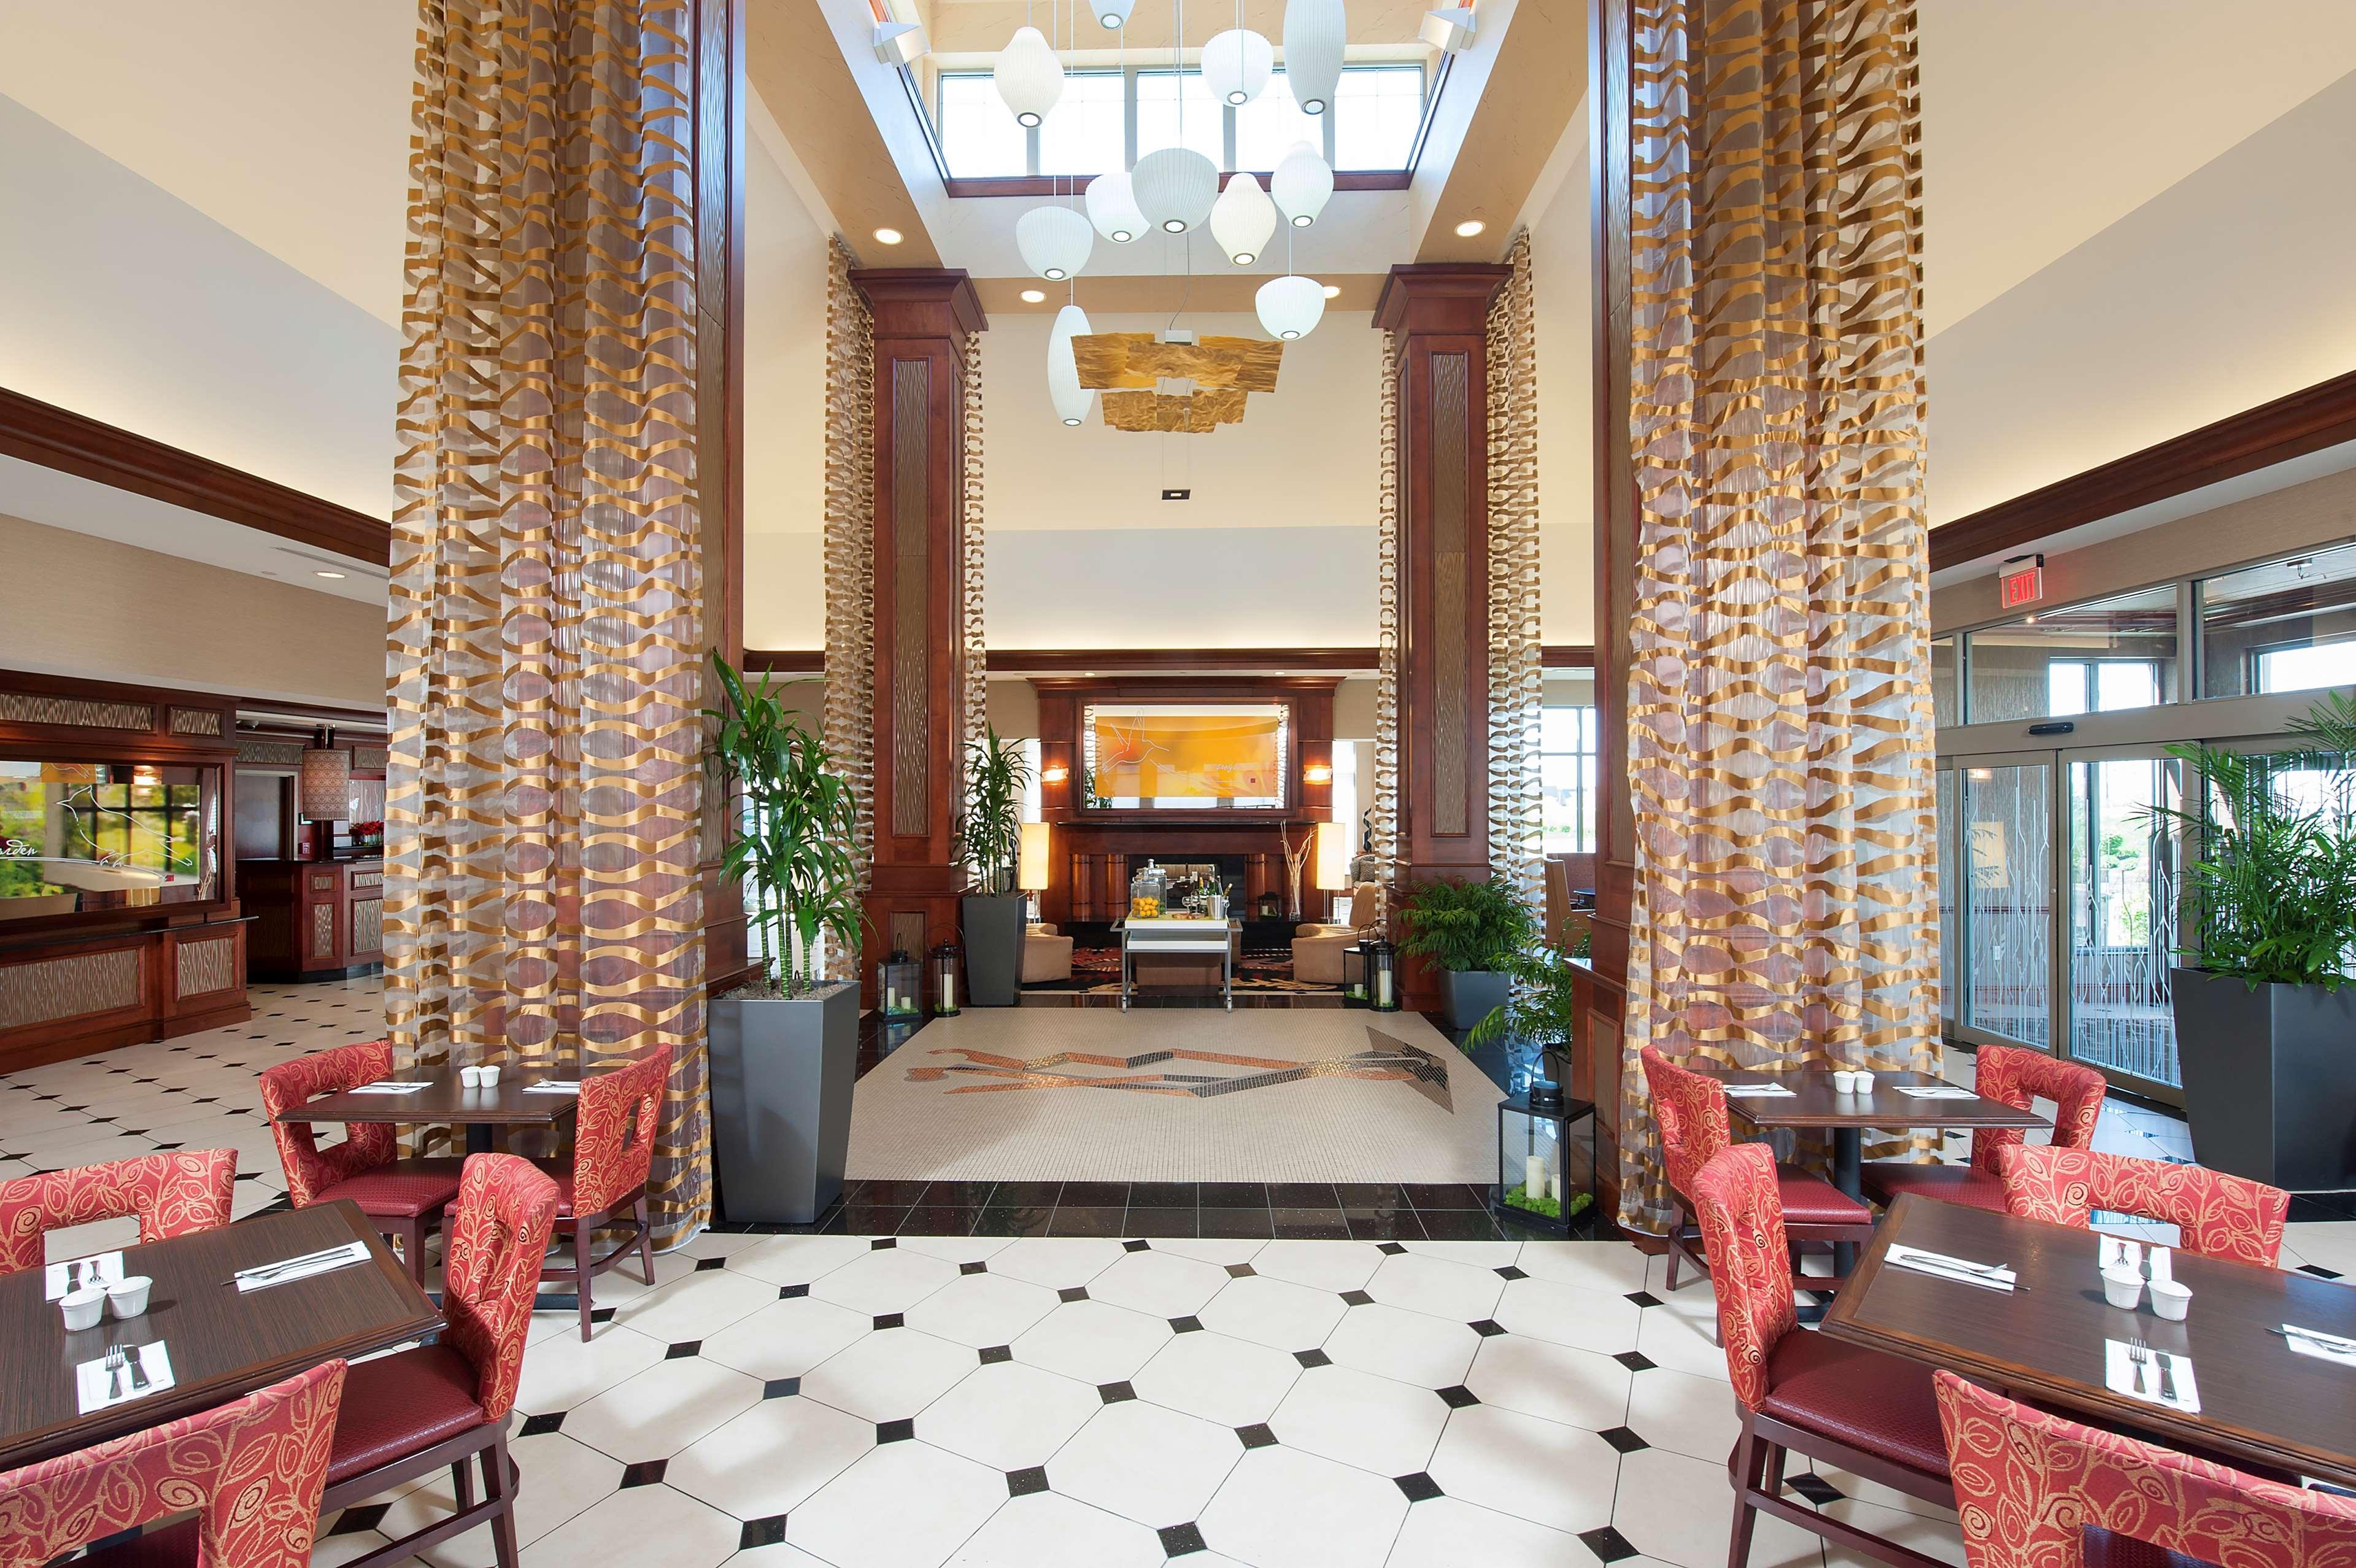 Hilton Garden Inn Indianapolis South/Greenwood image 4